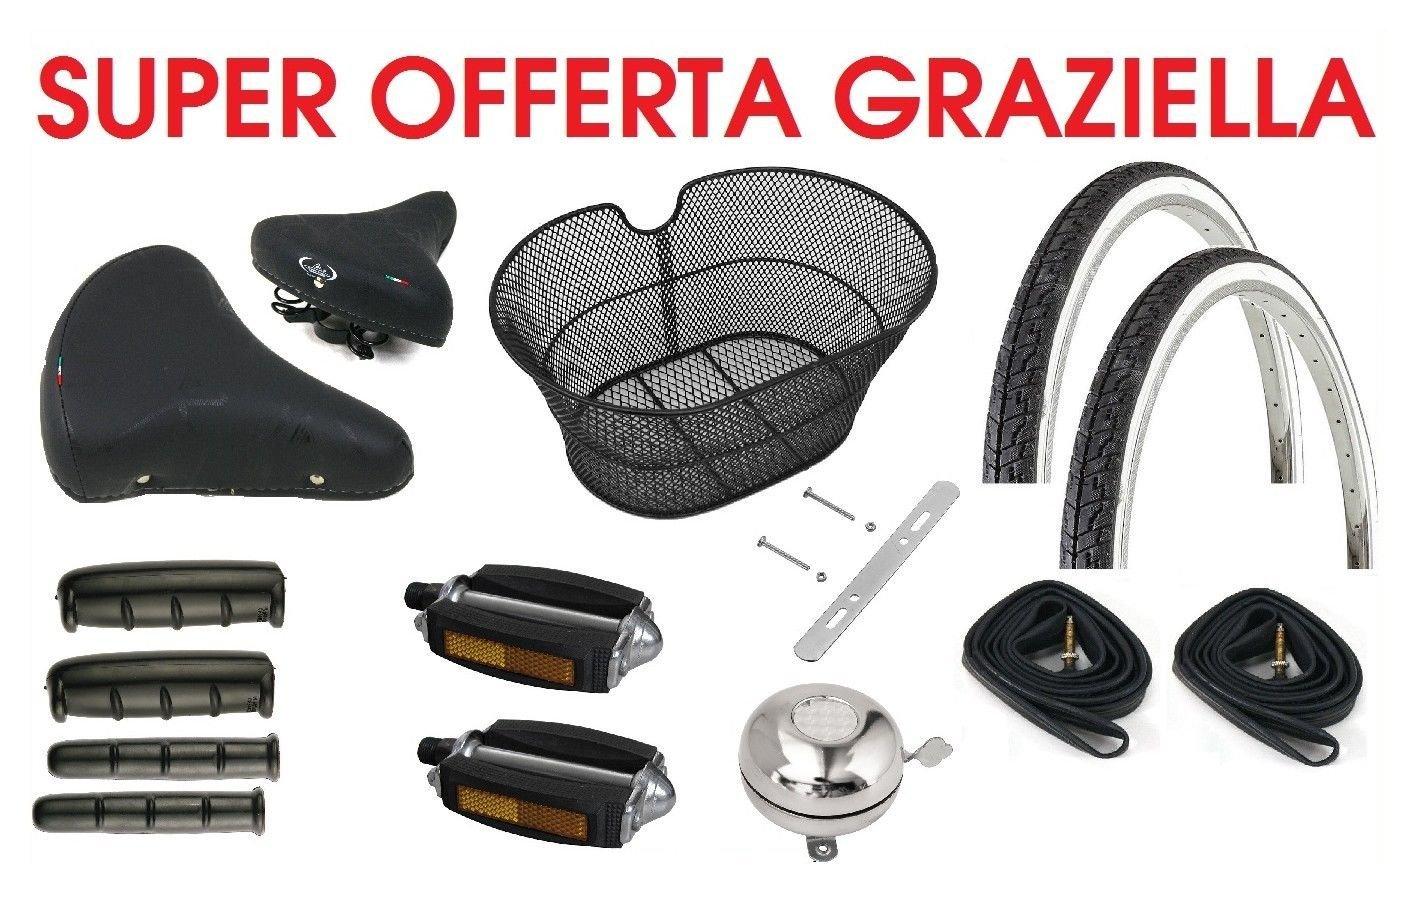 Kit 2 Tires 2 Inner Tubes White//Black Graziella Holland 20 x 1.75